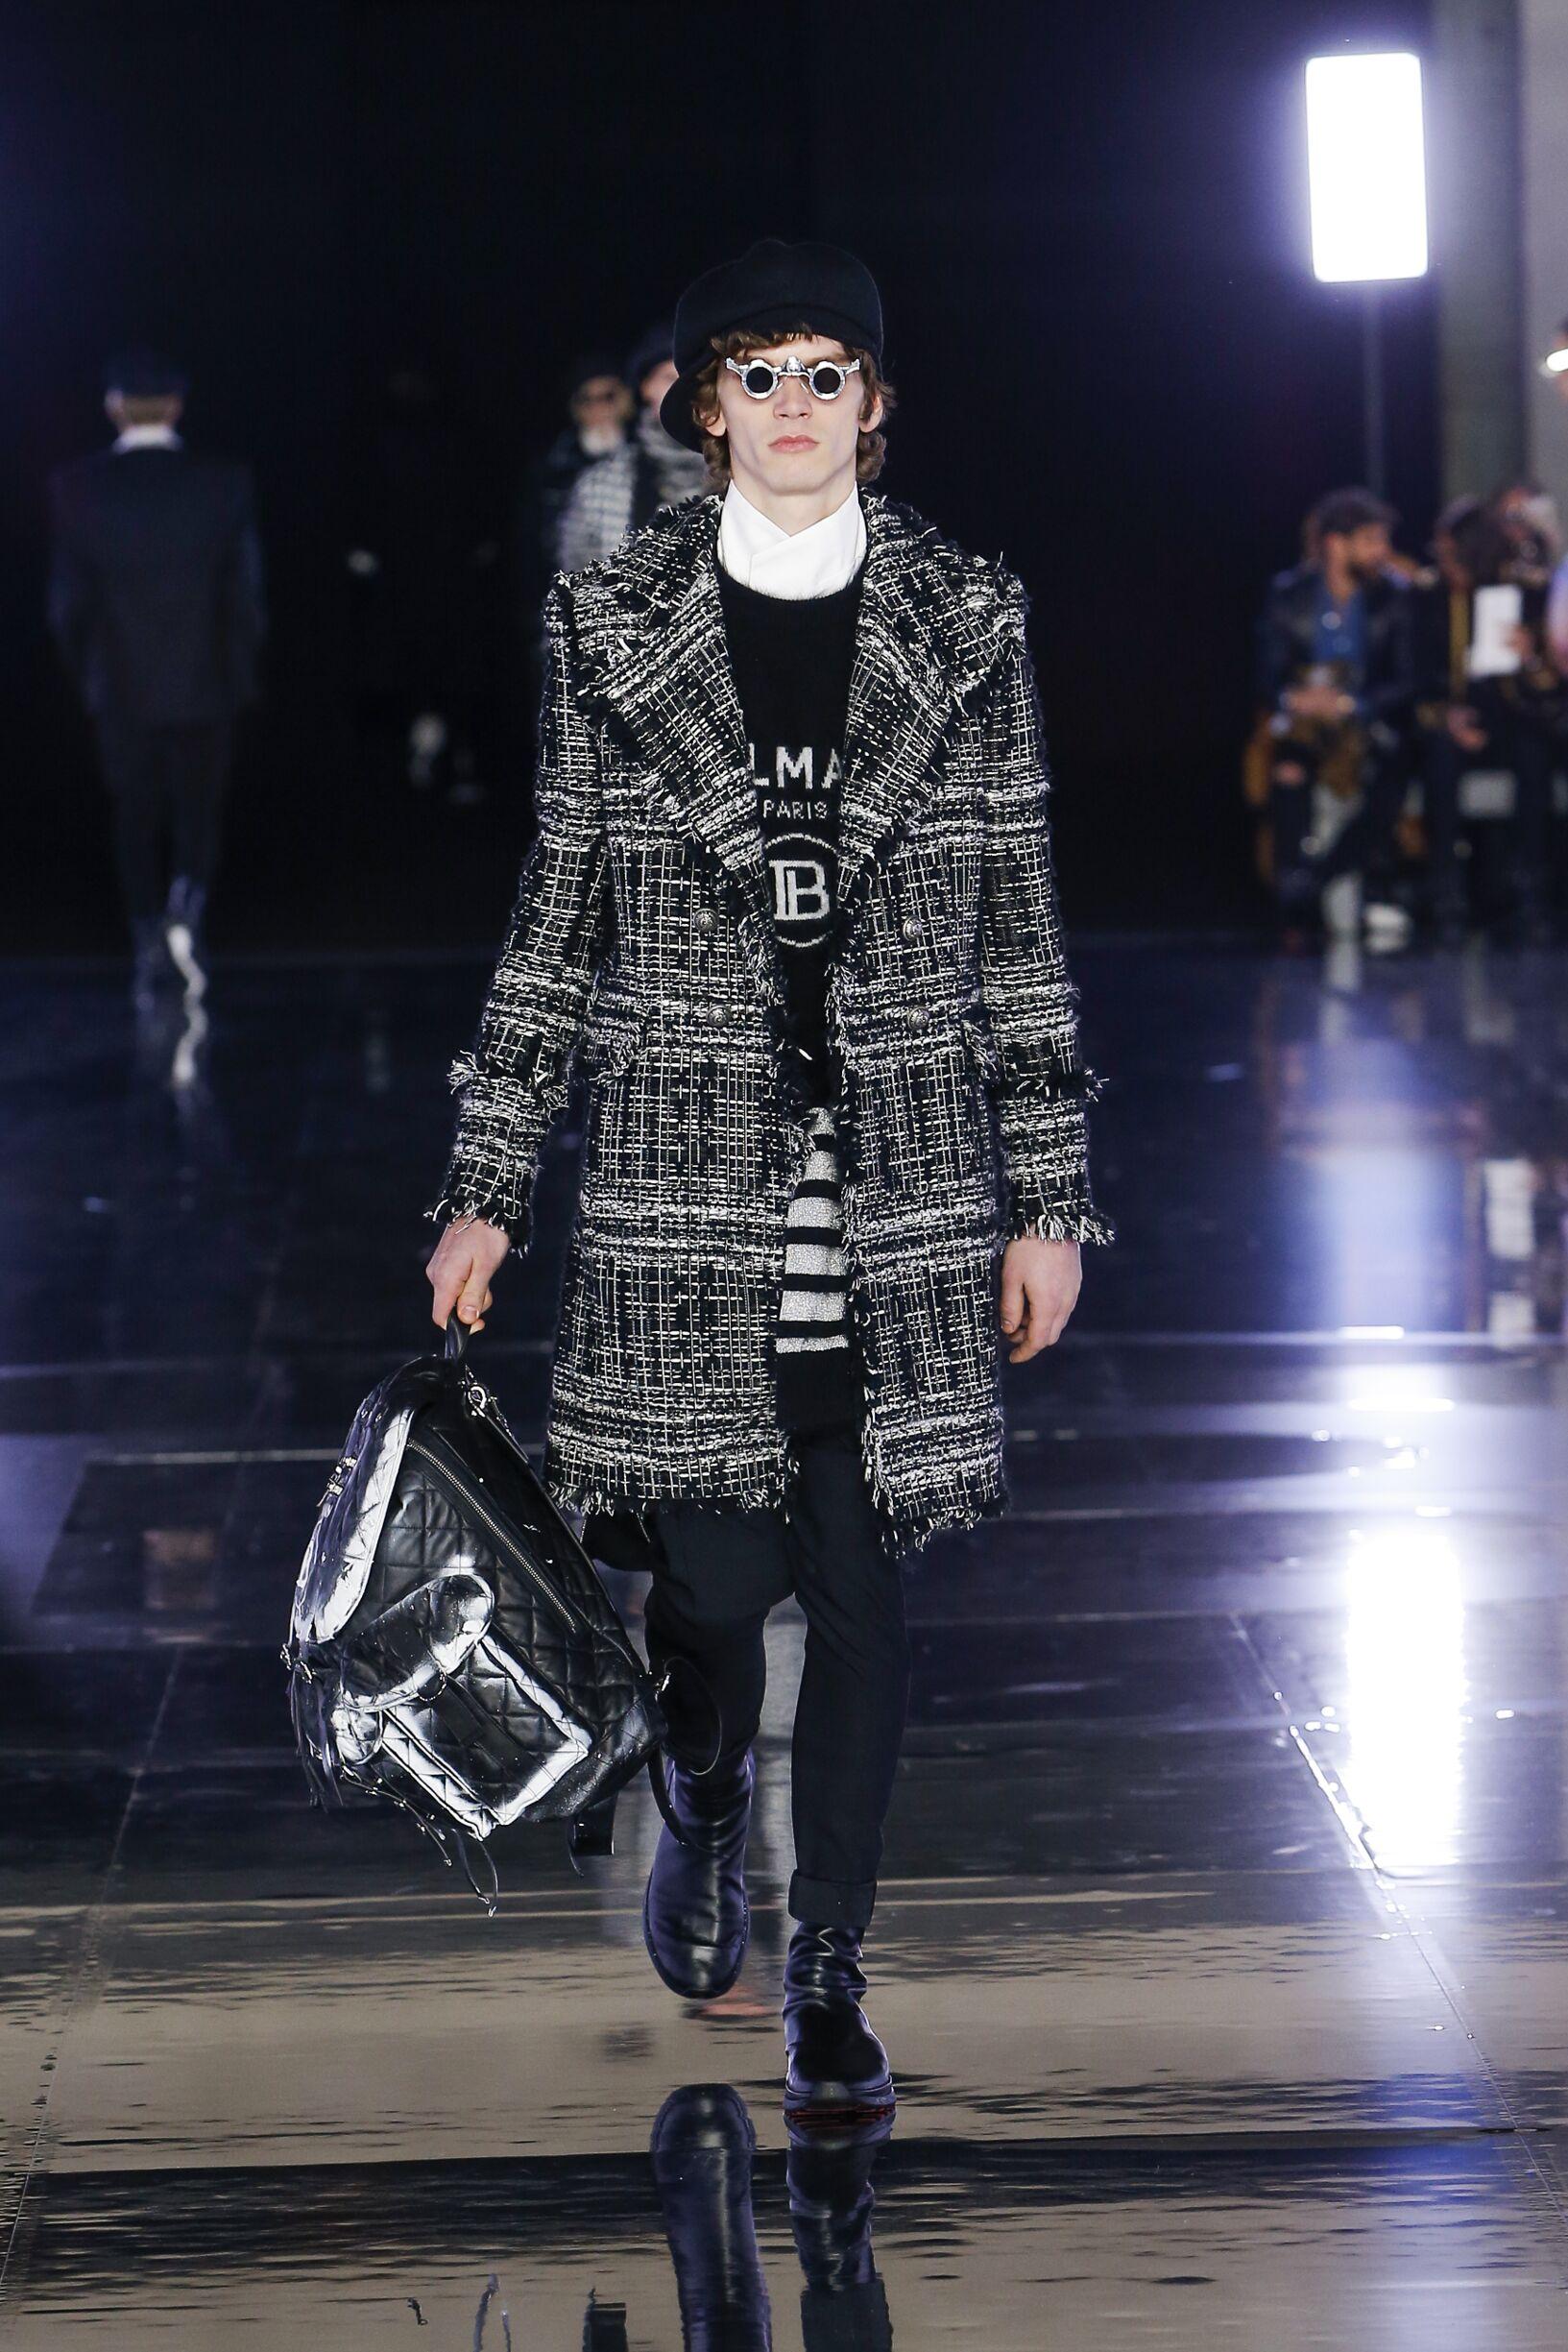 Runway Balmain Fall Winter 2019 Collection Paris Fashion Week